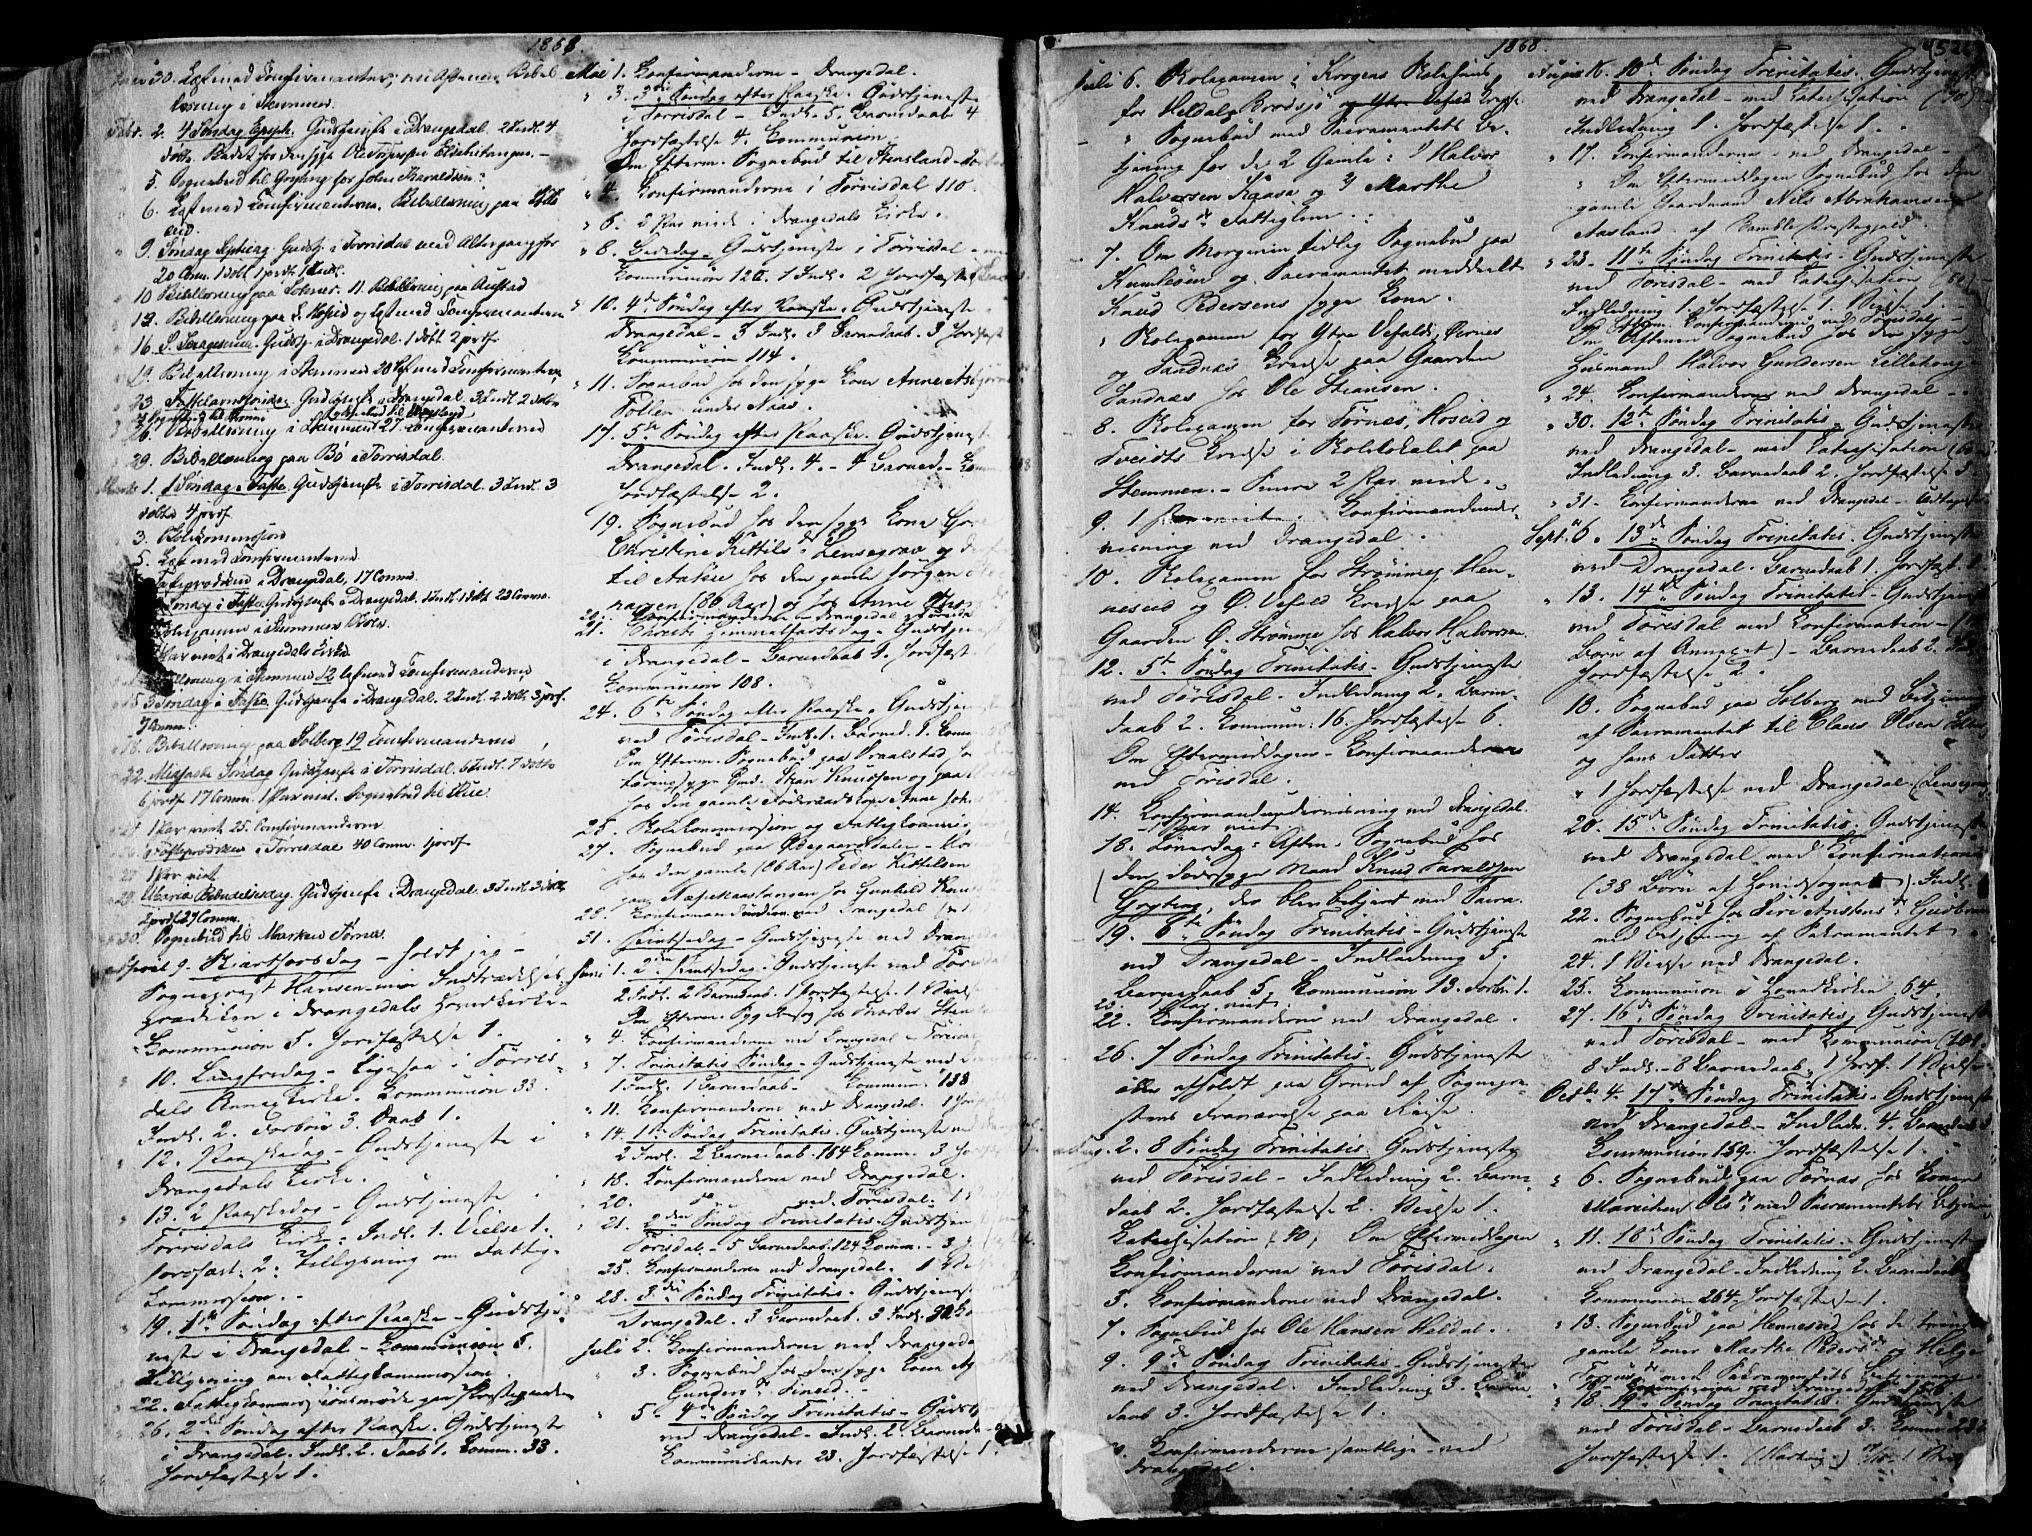 SAKO, Drangedal kirkebøker, F/Fa/L0008: Ministerialbok nr. 8, 1857-1871, s. 526